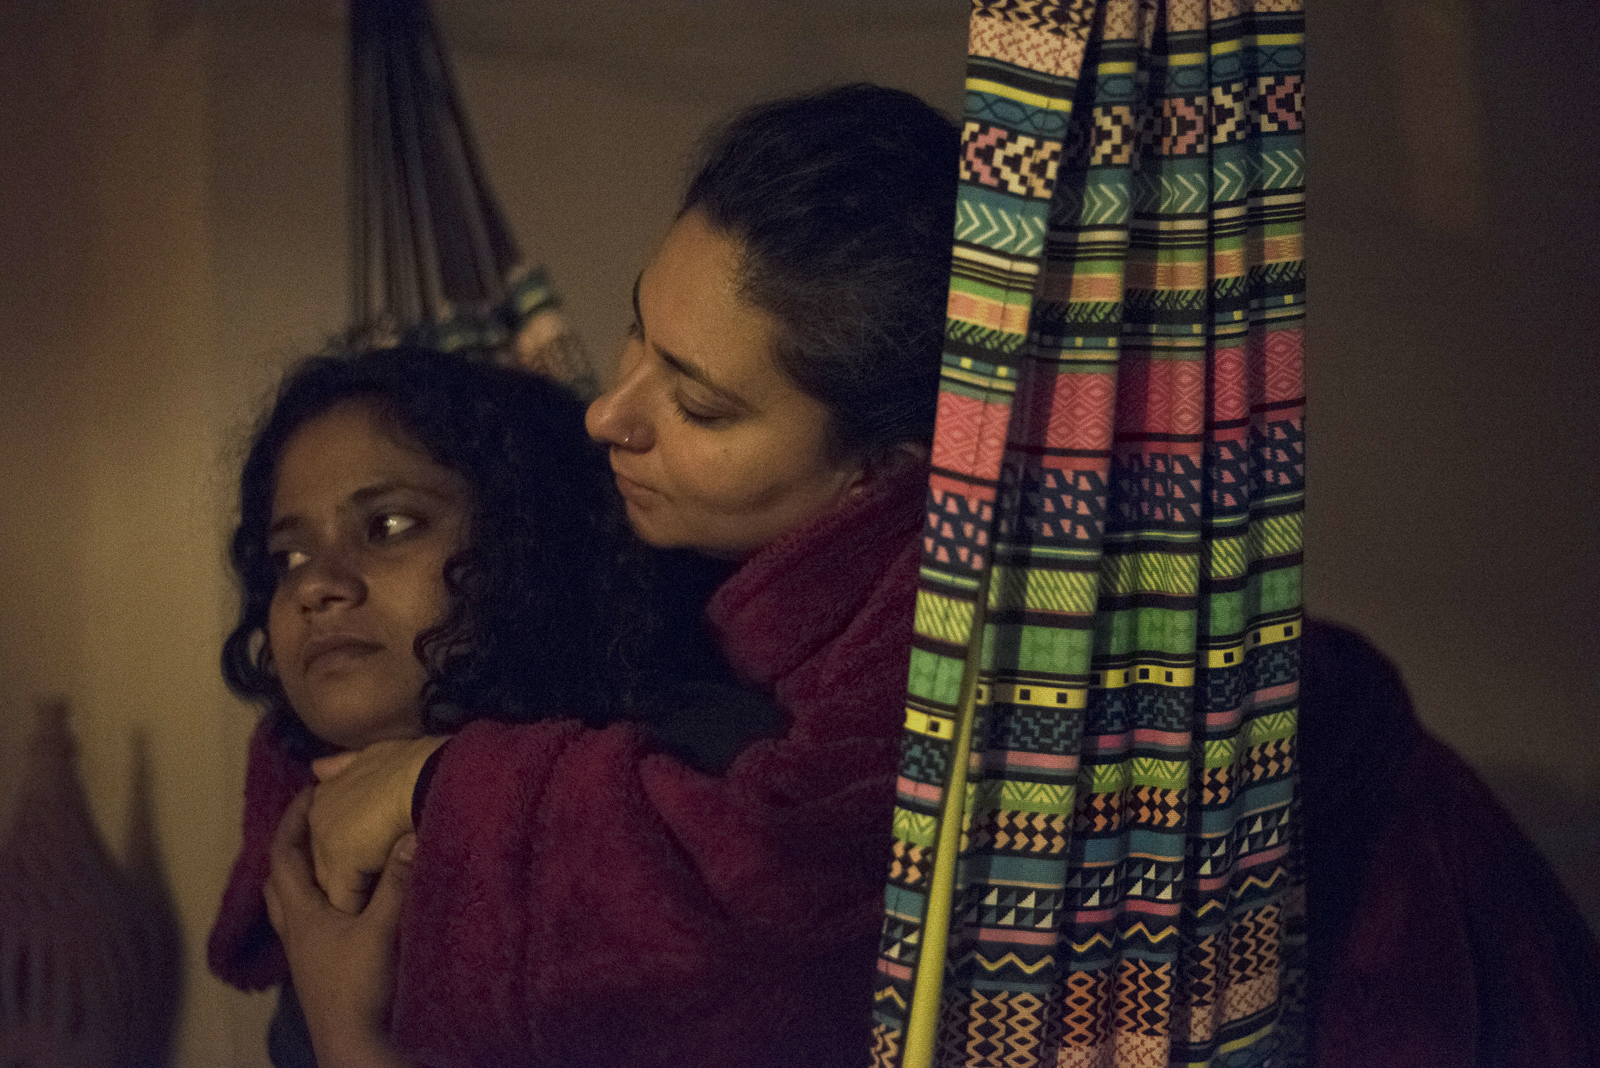 Sunil Gupta + Charan Singh, Akshara and Deepti #1,  from  Delhi: Communites of Belonging